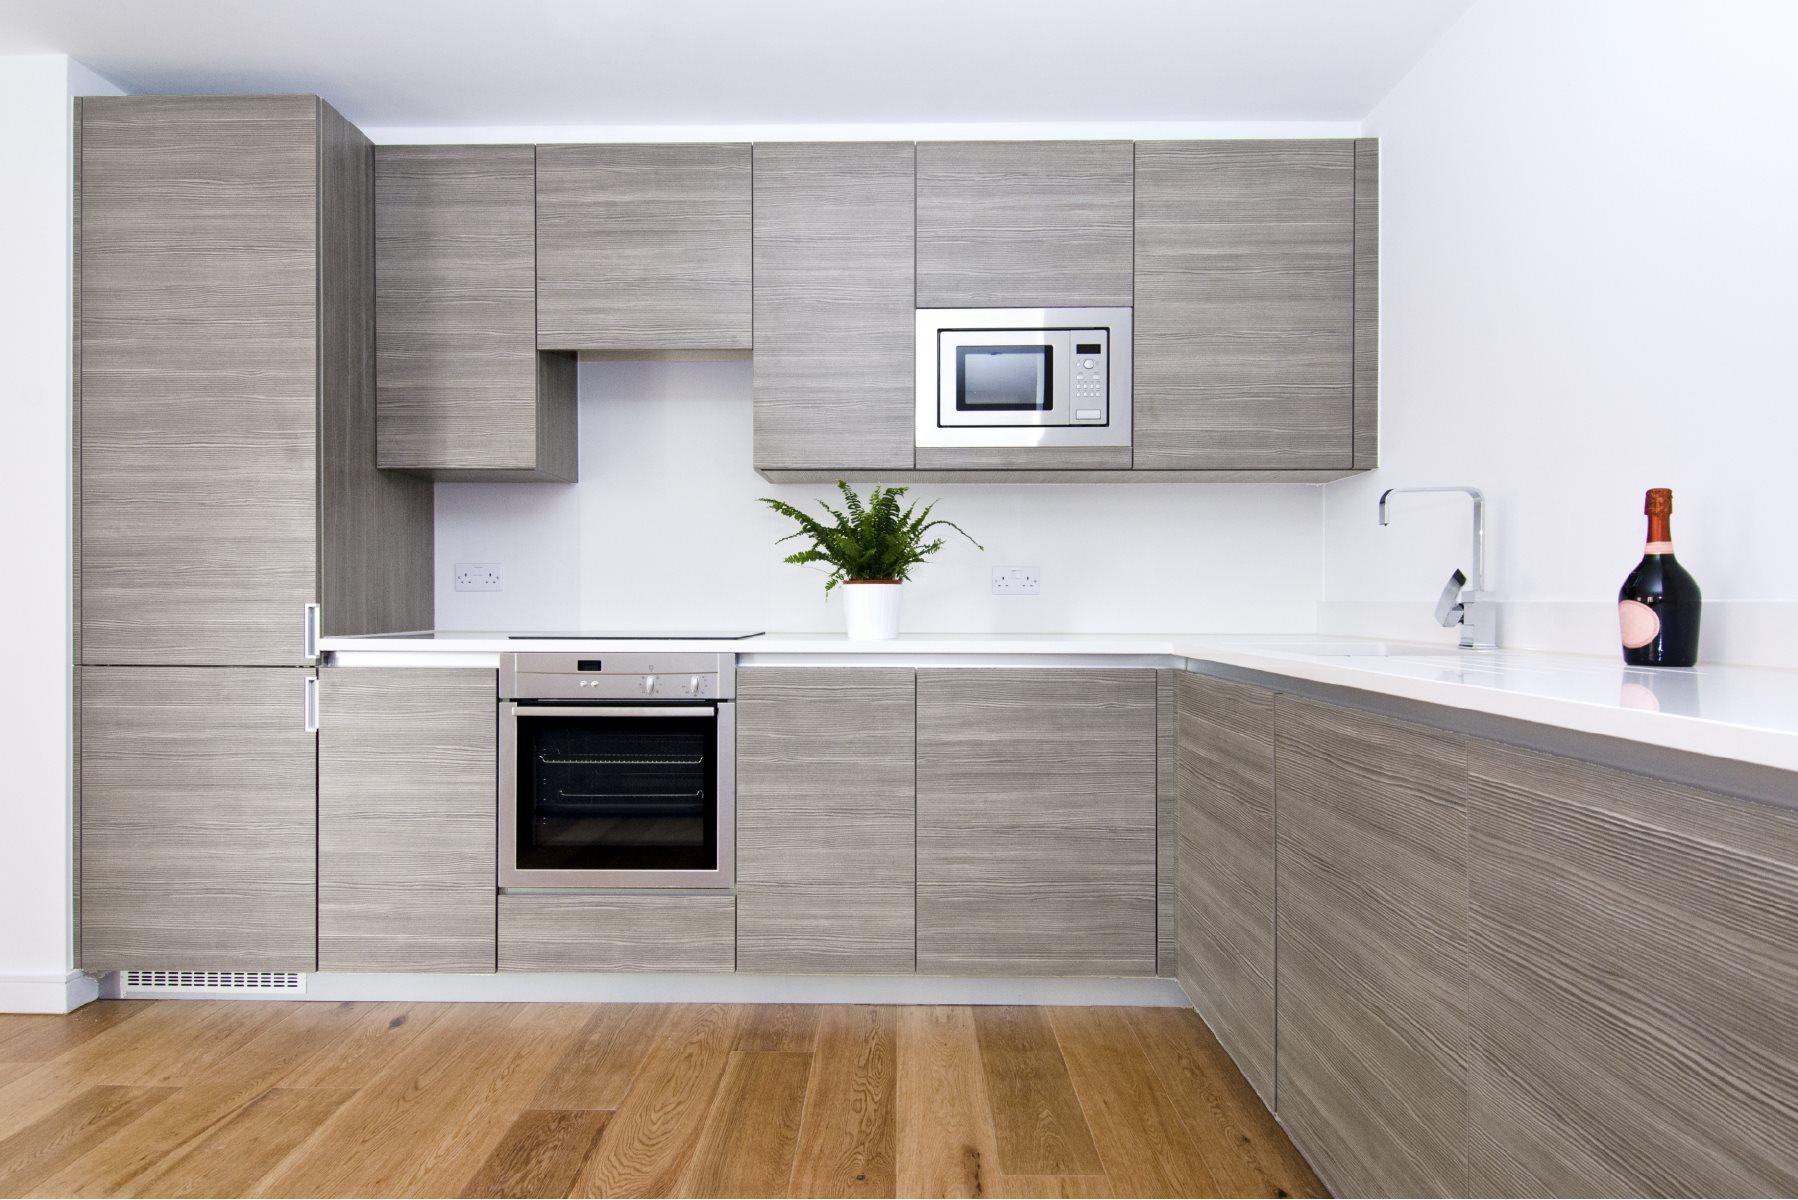 Modern Italian Kitchen Cabinet Design - CW Interiors in Trinidad ...